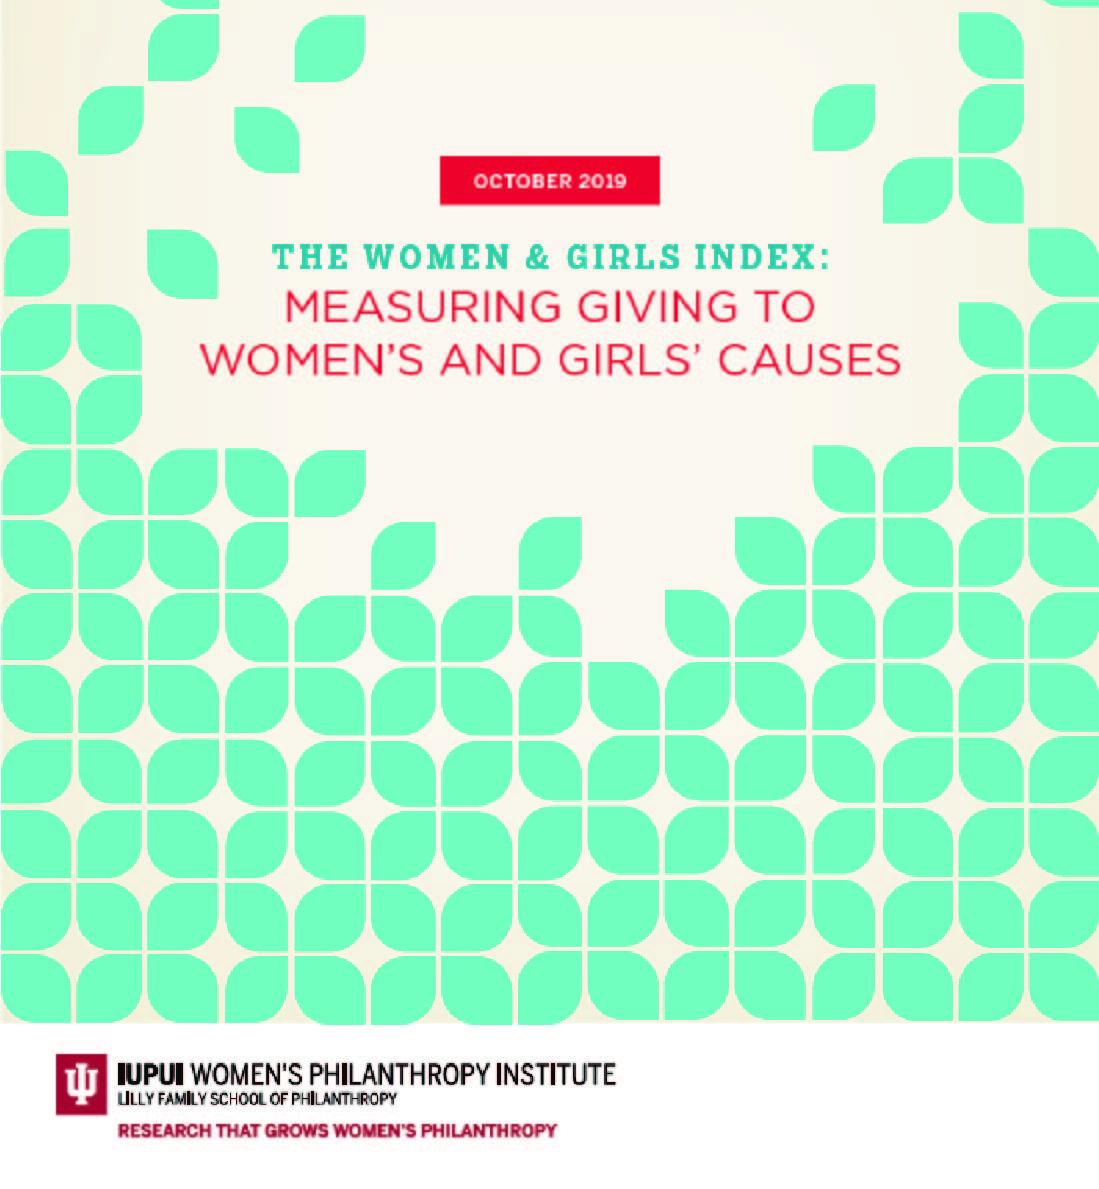 womens_philanthropy_institute.jpg